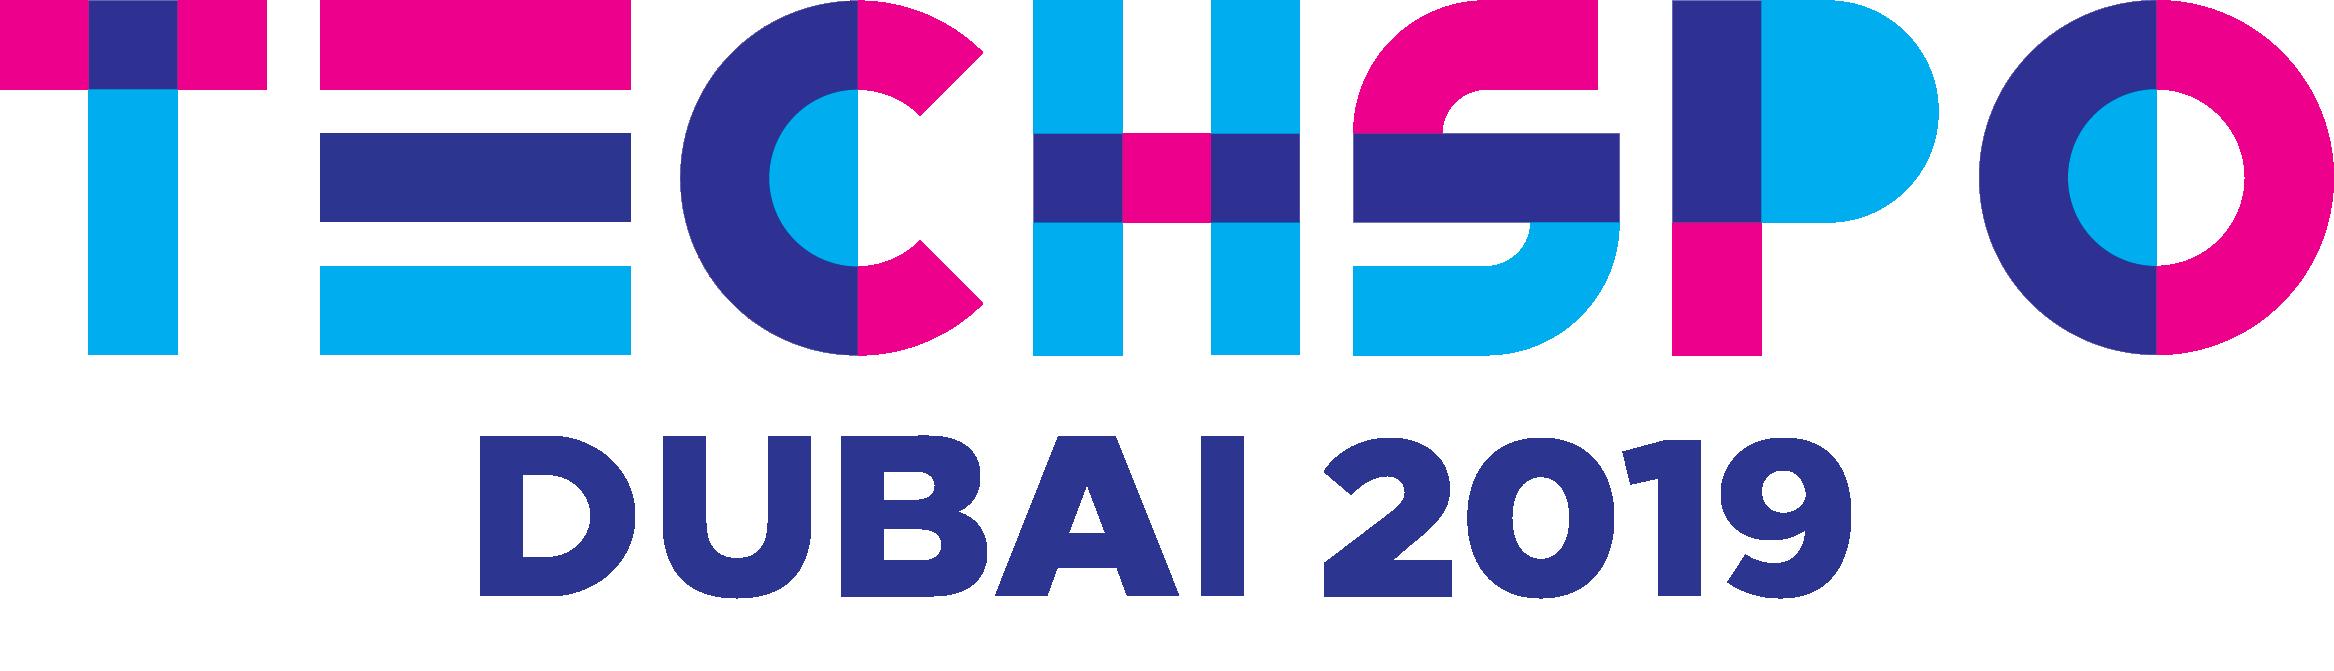 Business Tech And Innovation Head To Dubai For Techspo Dubai 2019